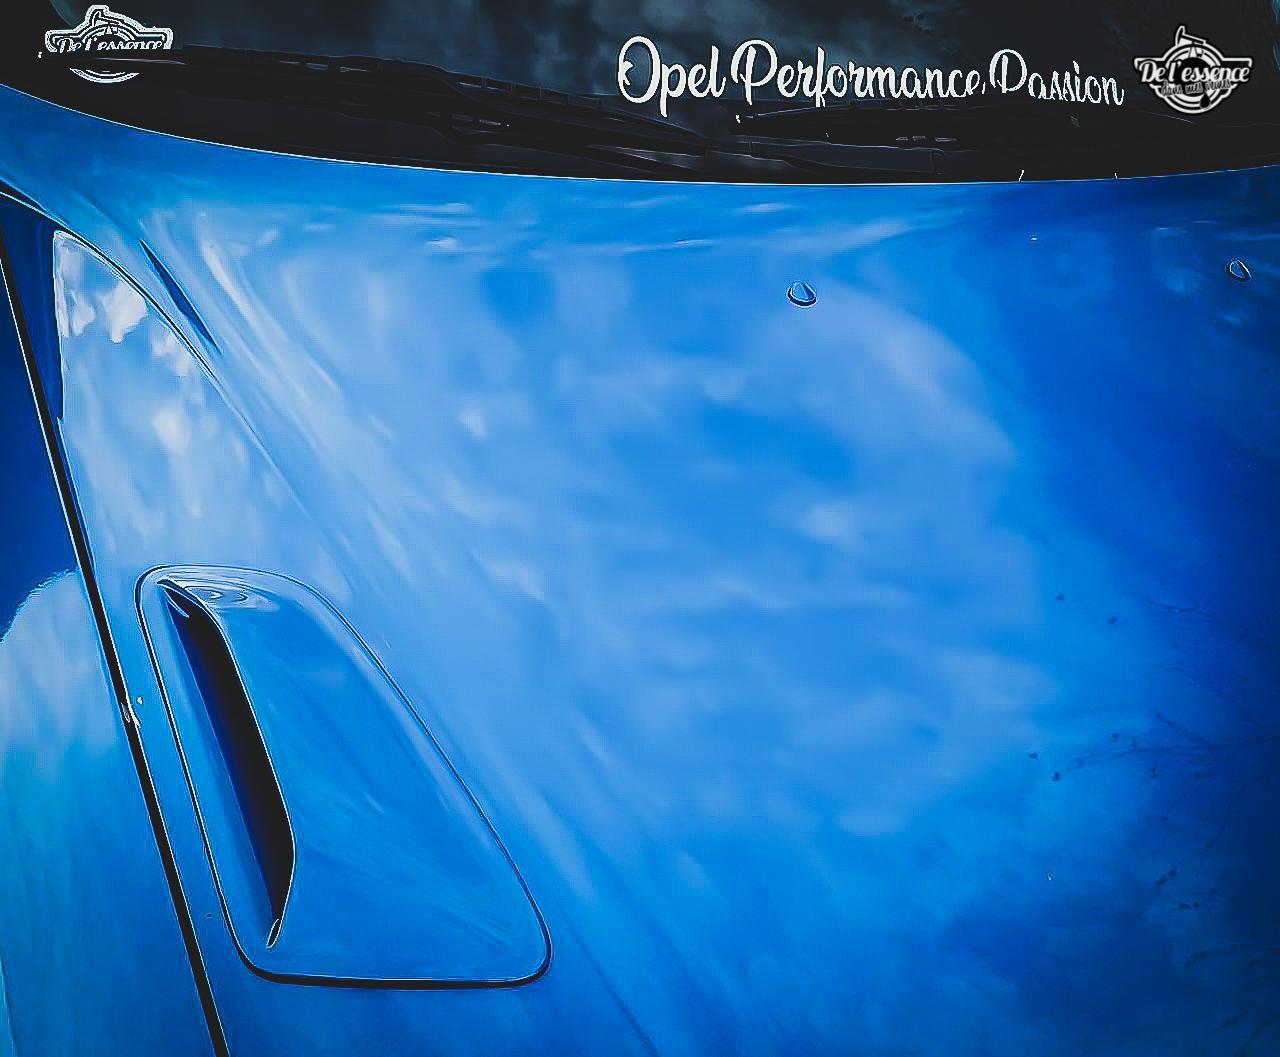 Opel Vectra V6 i500 replica... Papa pressé ! 14